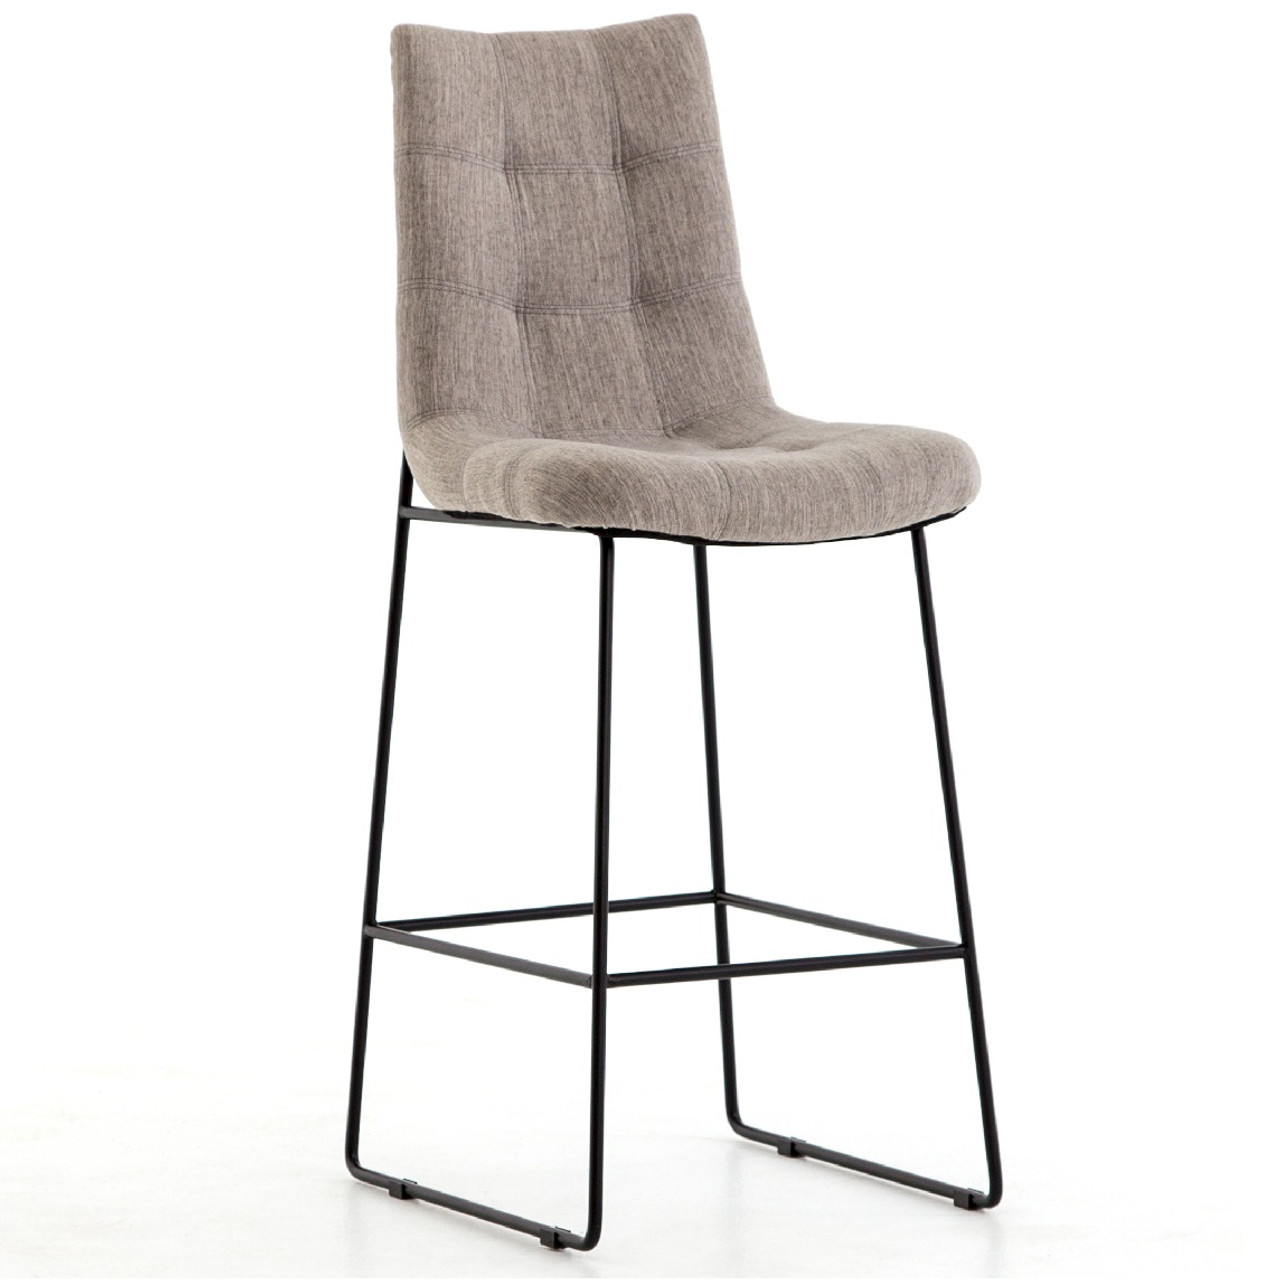 Excellent Camile Black Iron Leg Bar Stool Savile Flannel Uwap Interior Chair Design Uwaporg